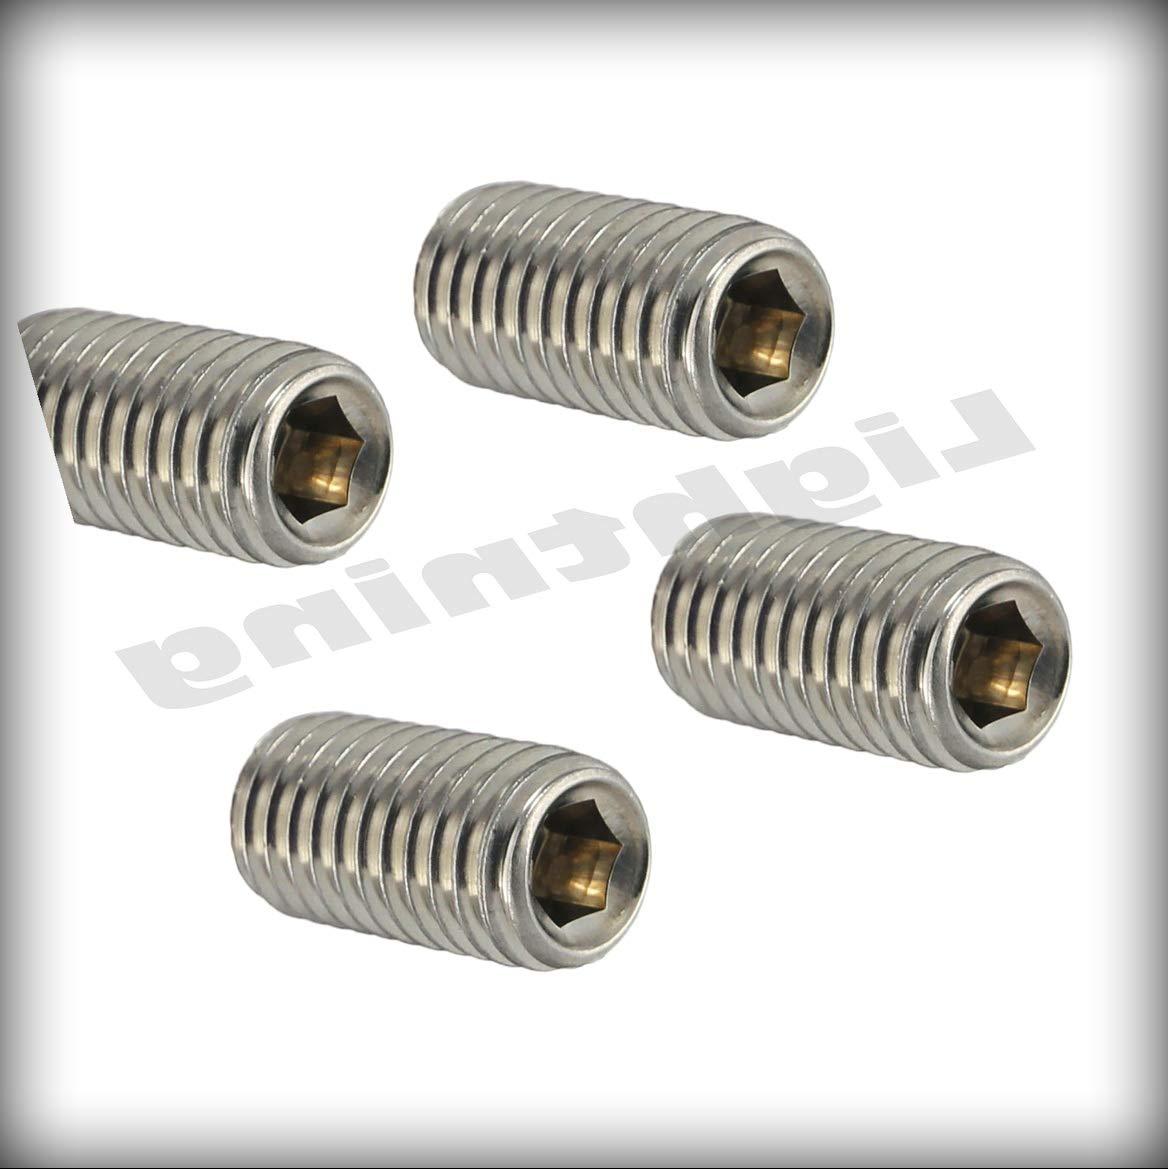 Socket Set Screws Set Stainless Steel 5/16-18 x 3/8-inch Pack of 1000 Warranity by Pr-Merchant